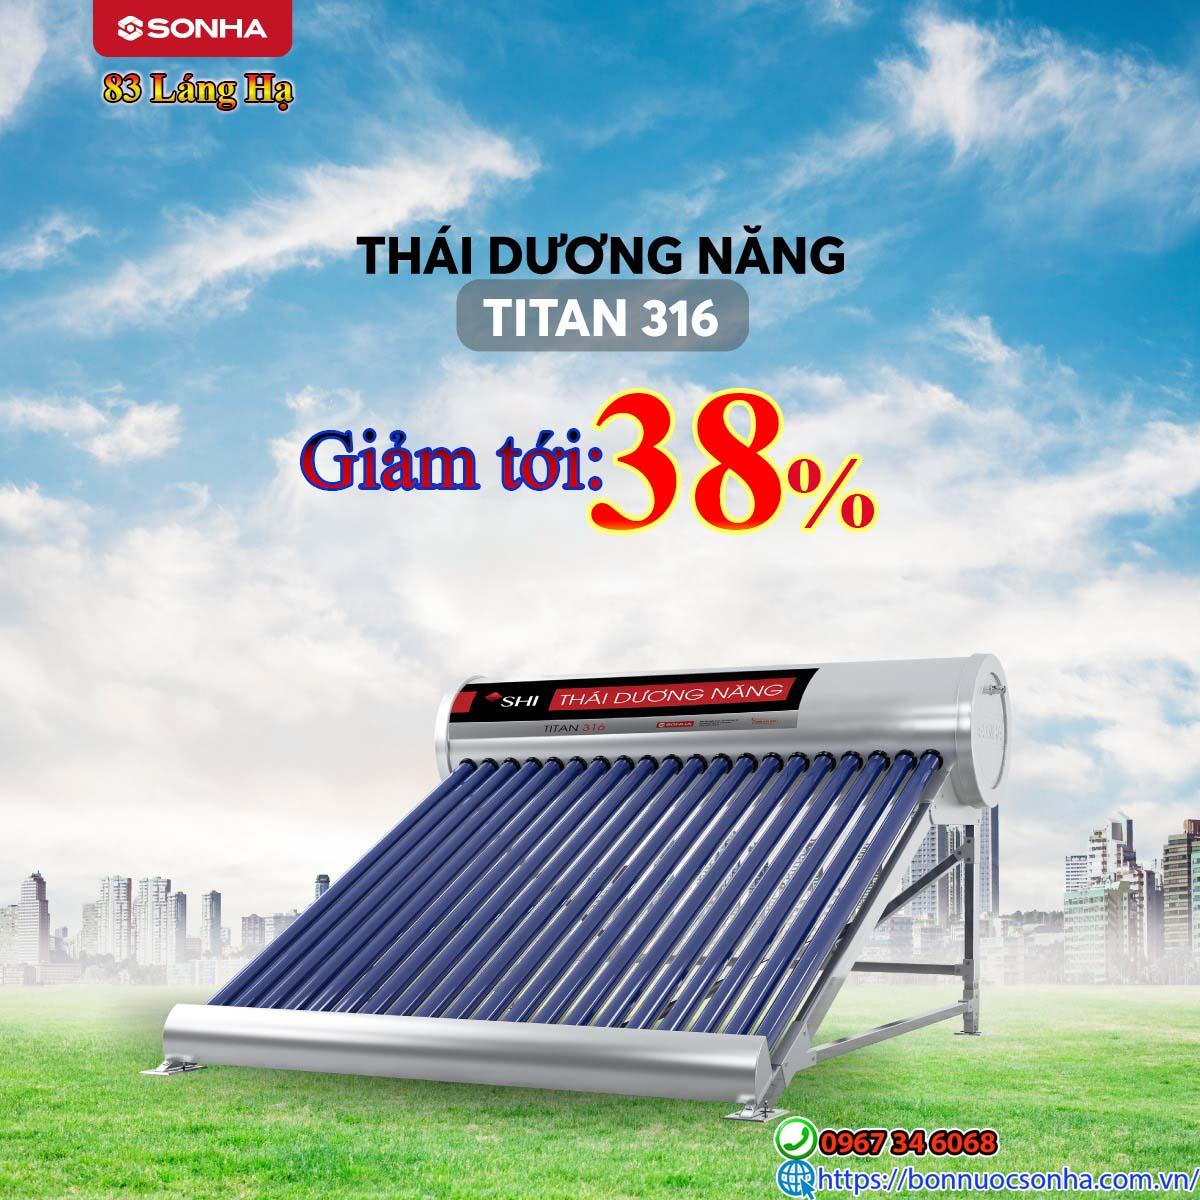 Thai Duong Nang Titan 316 Giam Toi 38 %